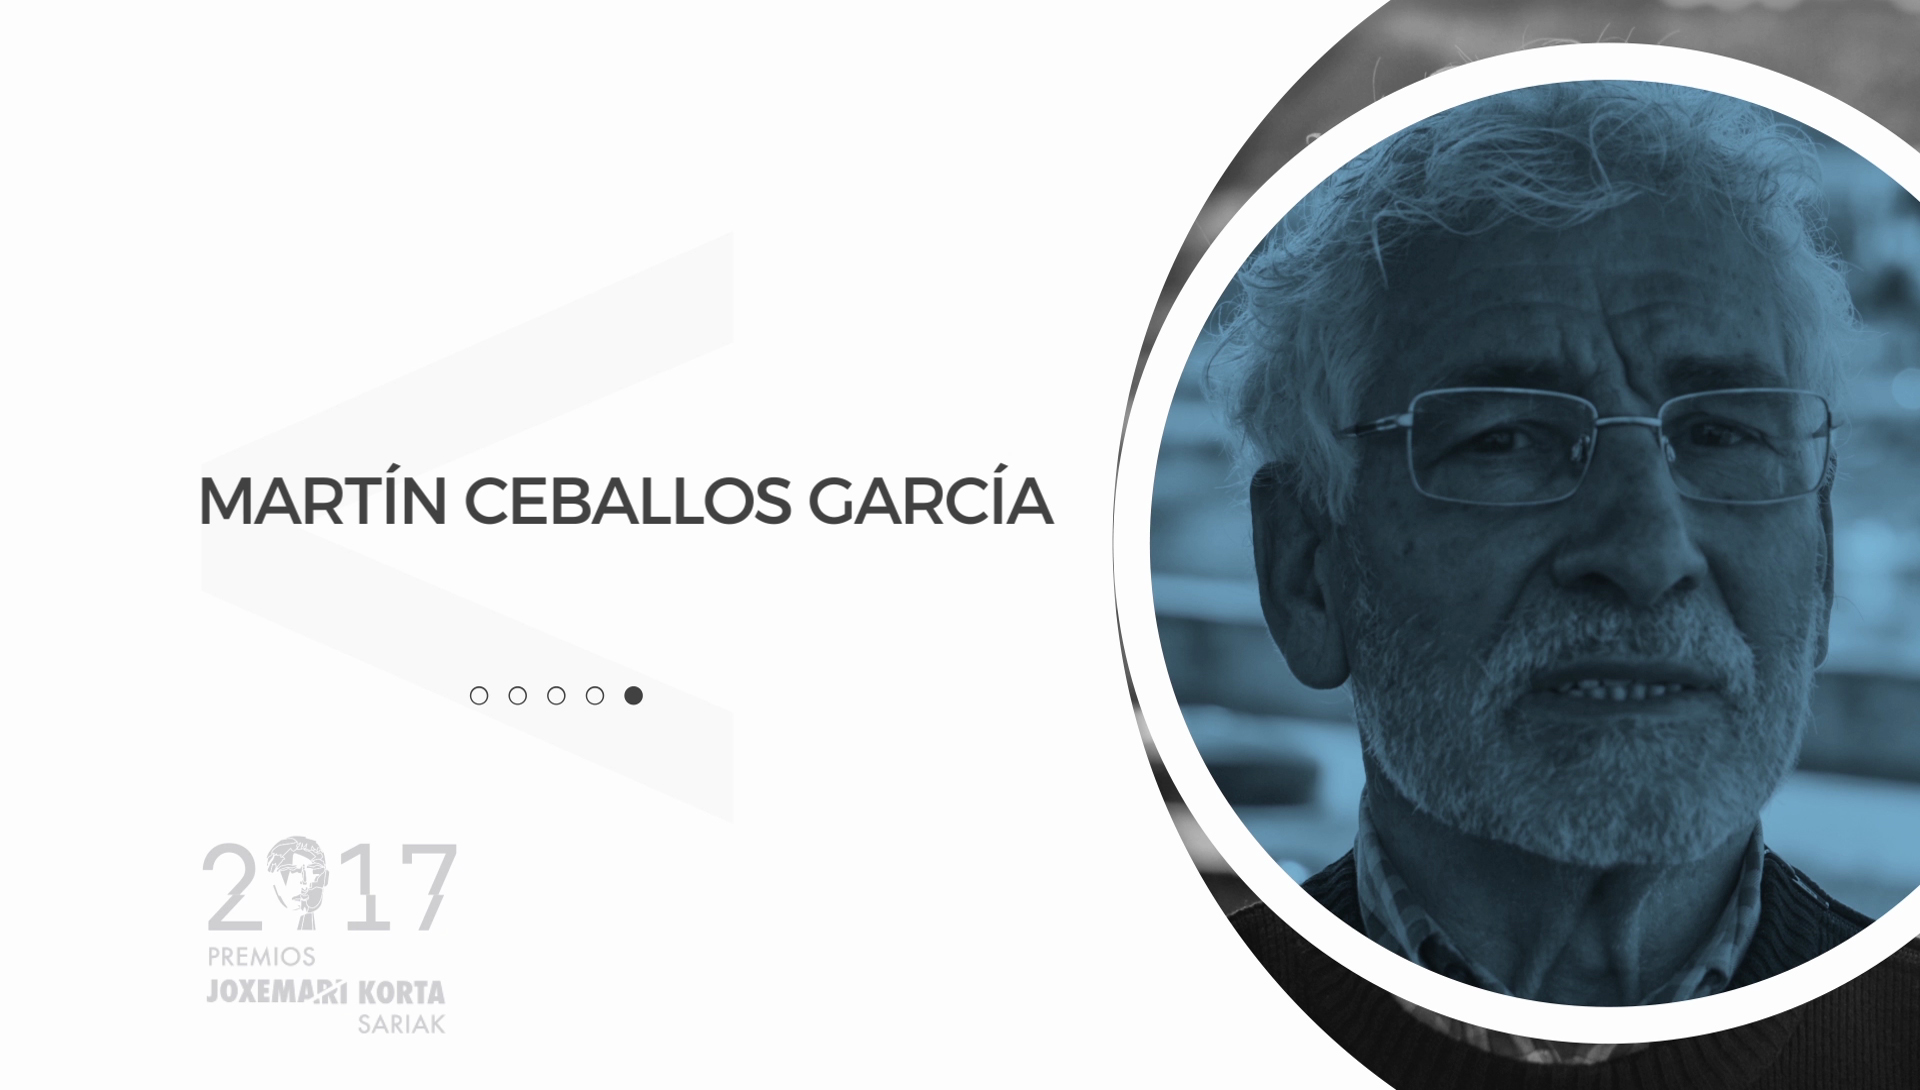 Martín Ceballos (Talleres Marel). Premios Korta Sariak 2017